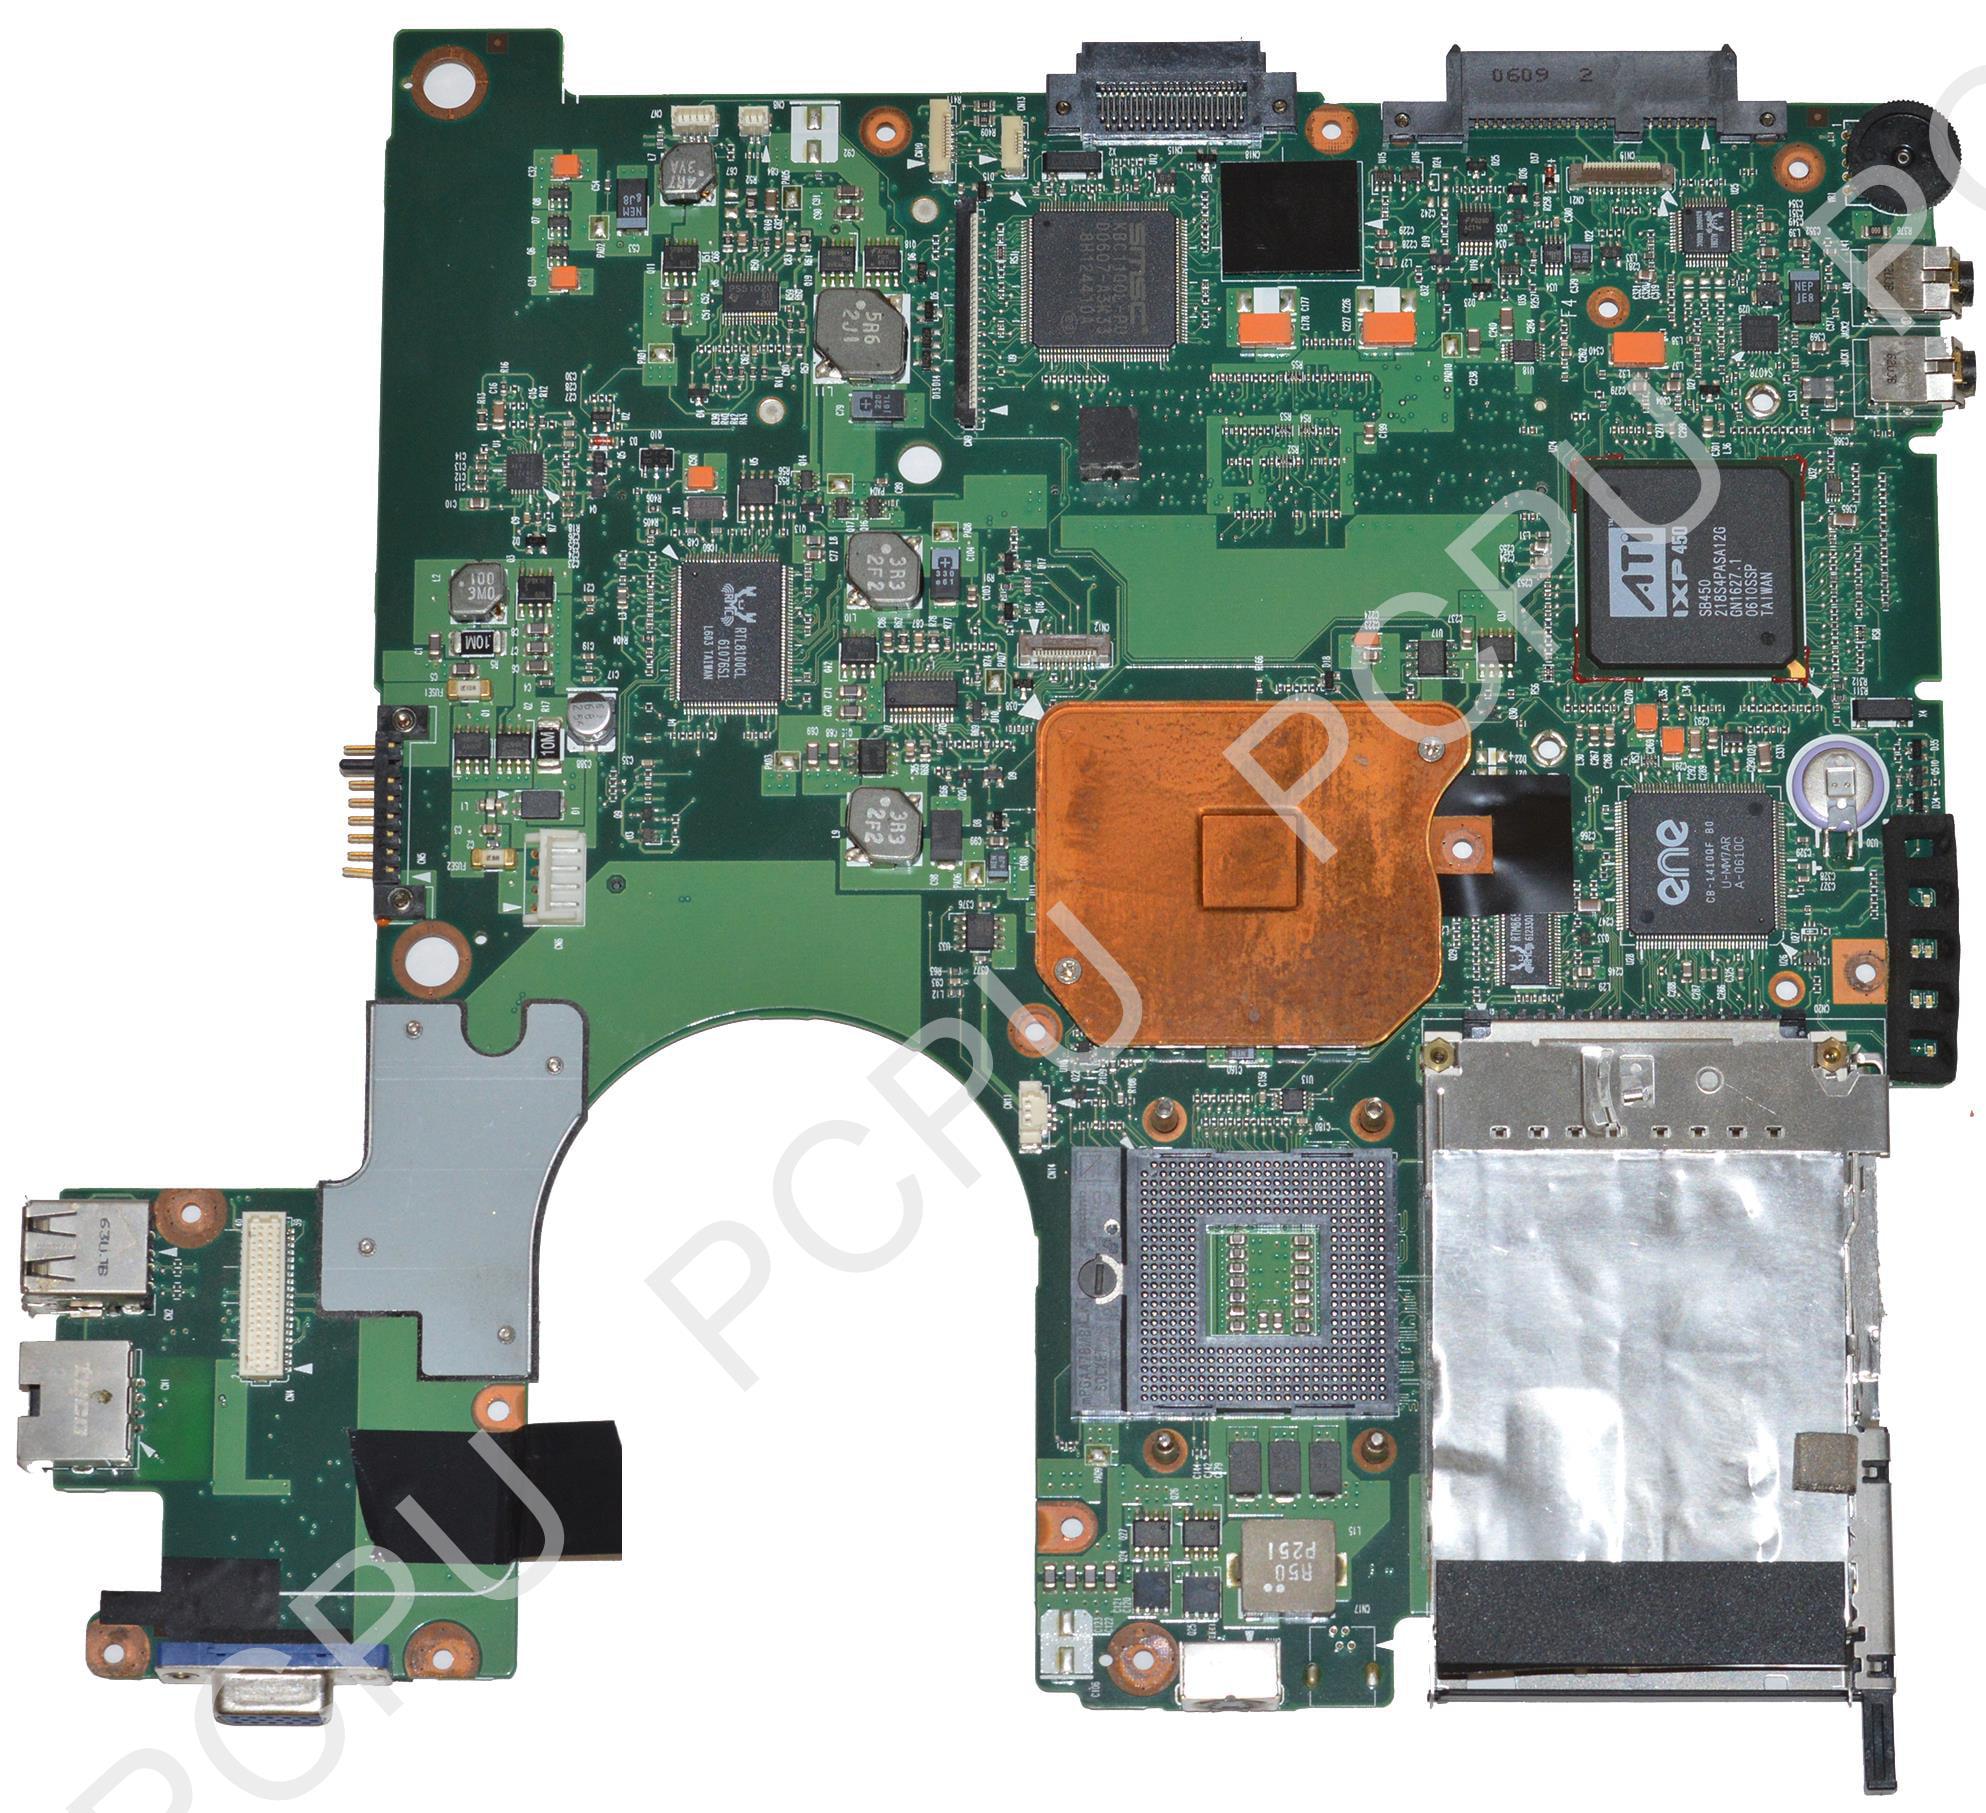 Toshiba A105 SYSTEM BOARD W/ ATI 200M